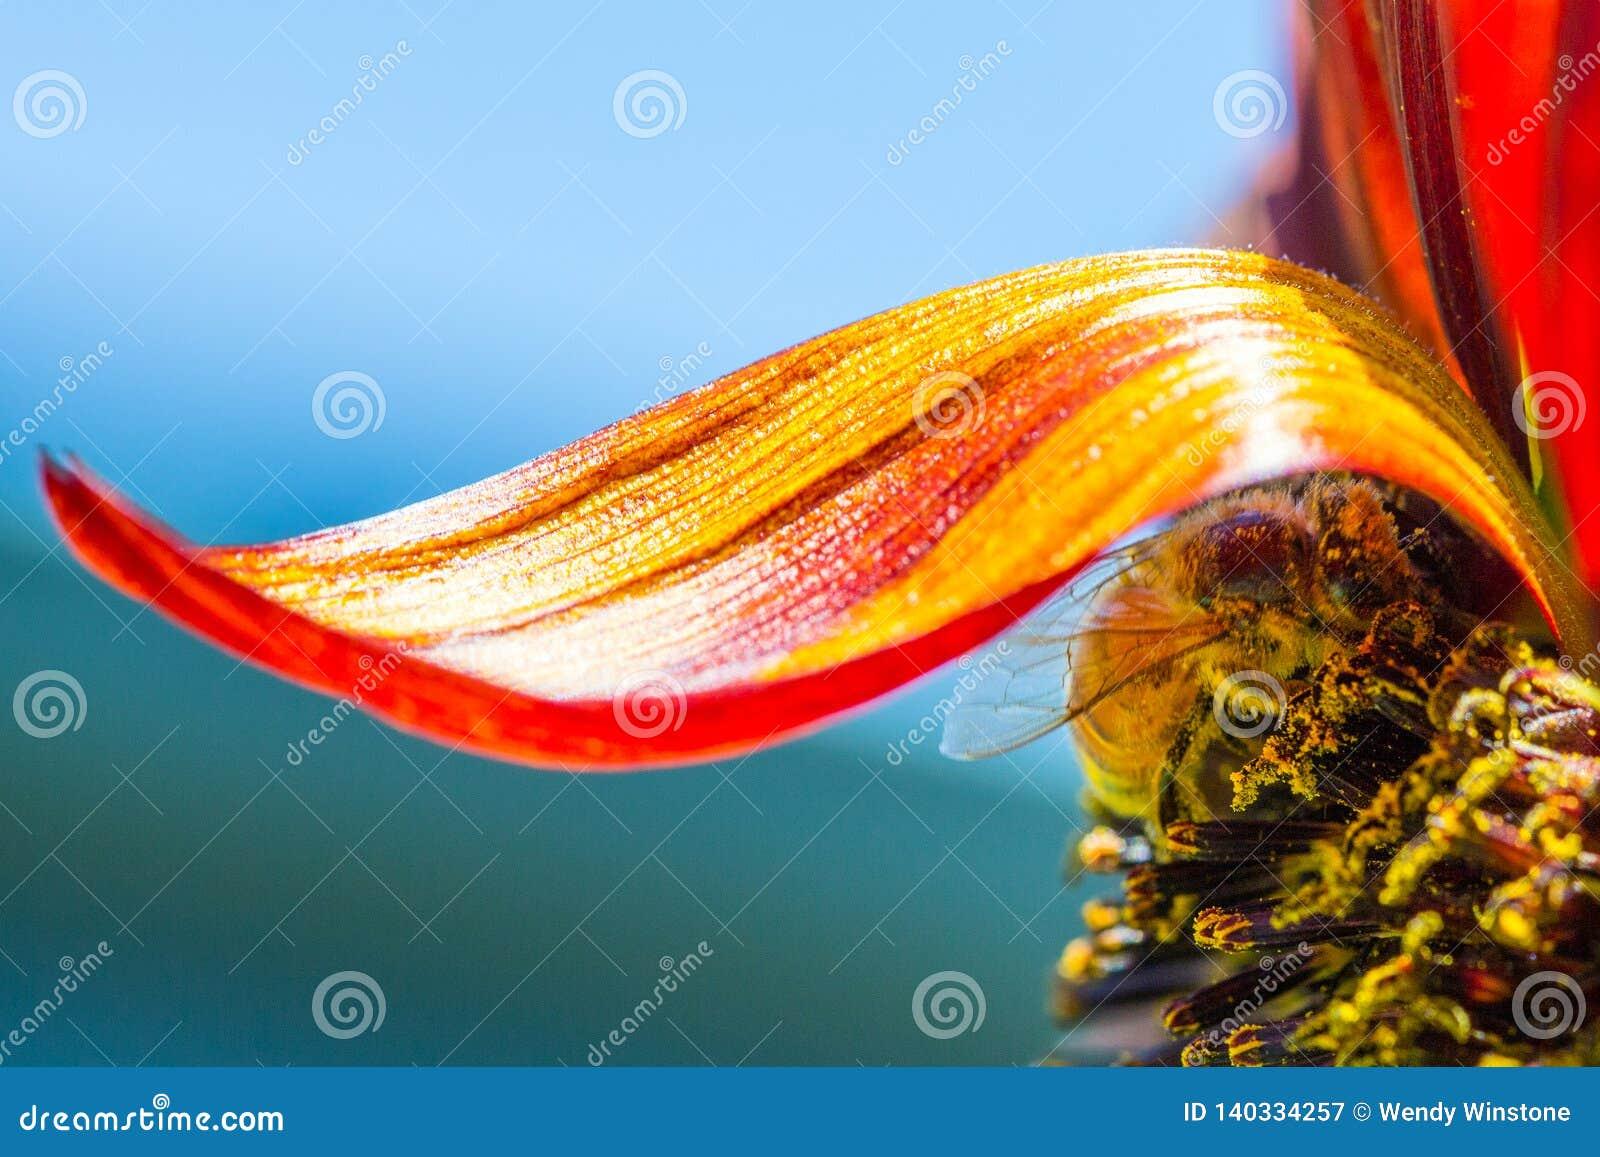 Honey bee under a single prado sunflower petal